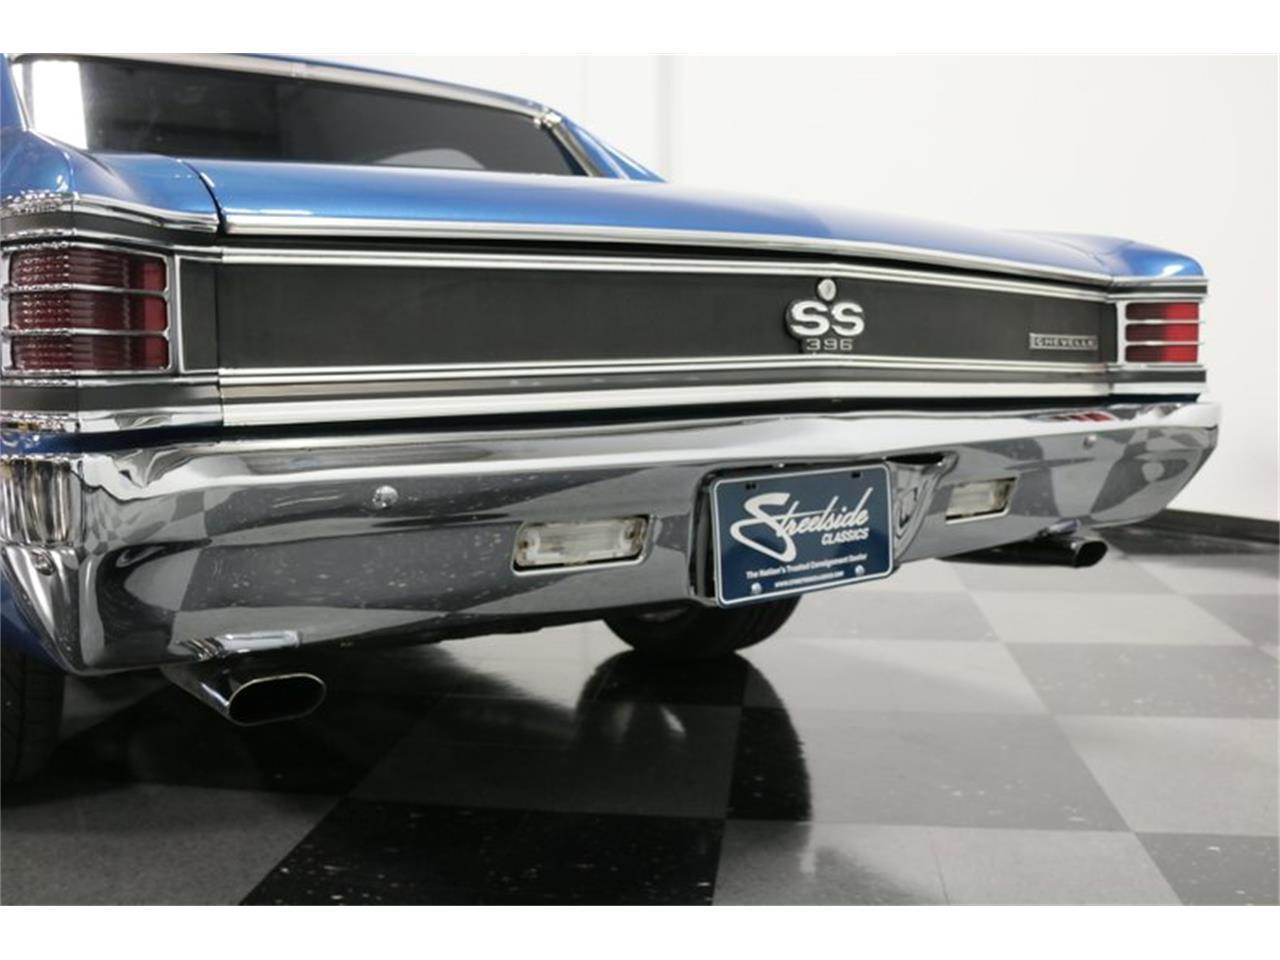 Large Picture of 1967 Chevrolet Chevelle - $44,995.00 - Q46D